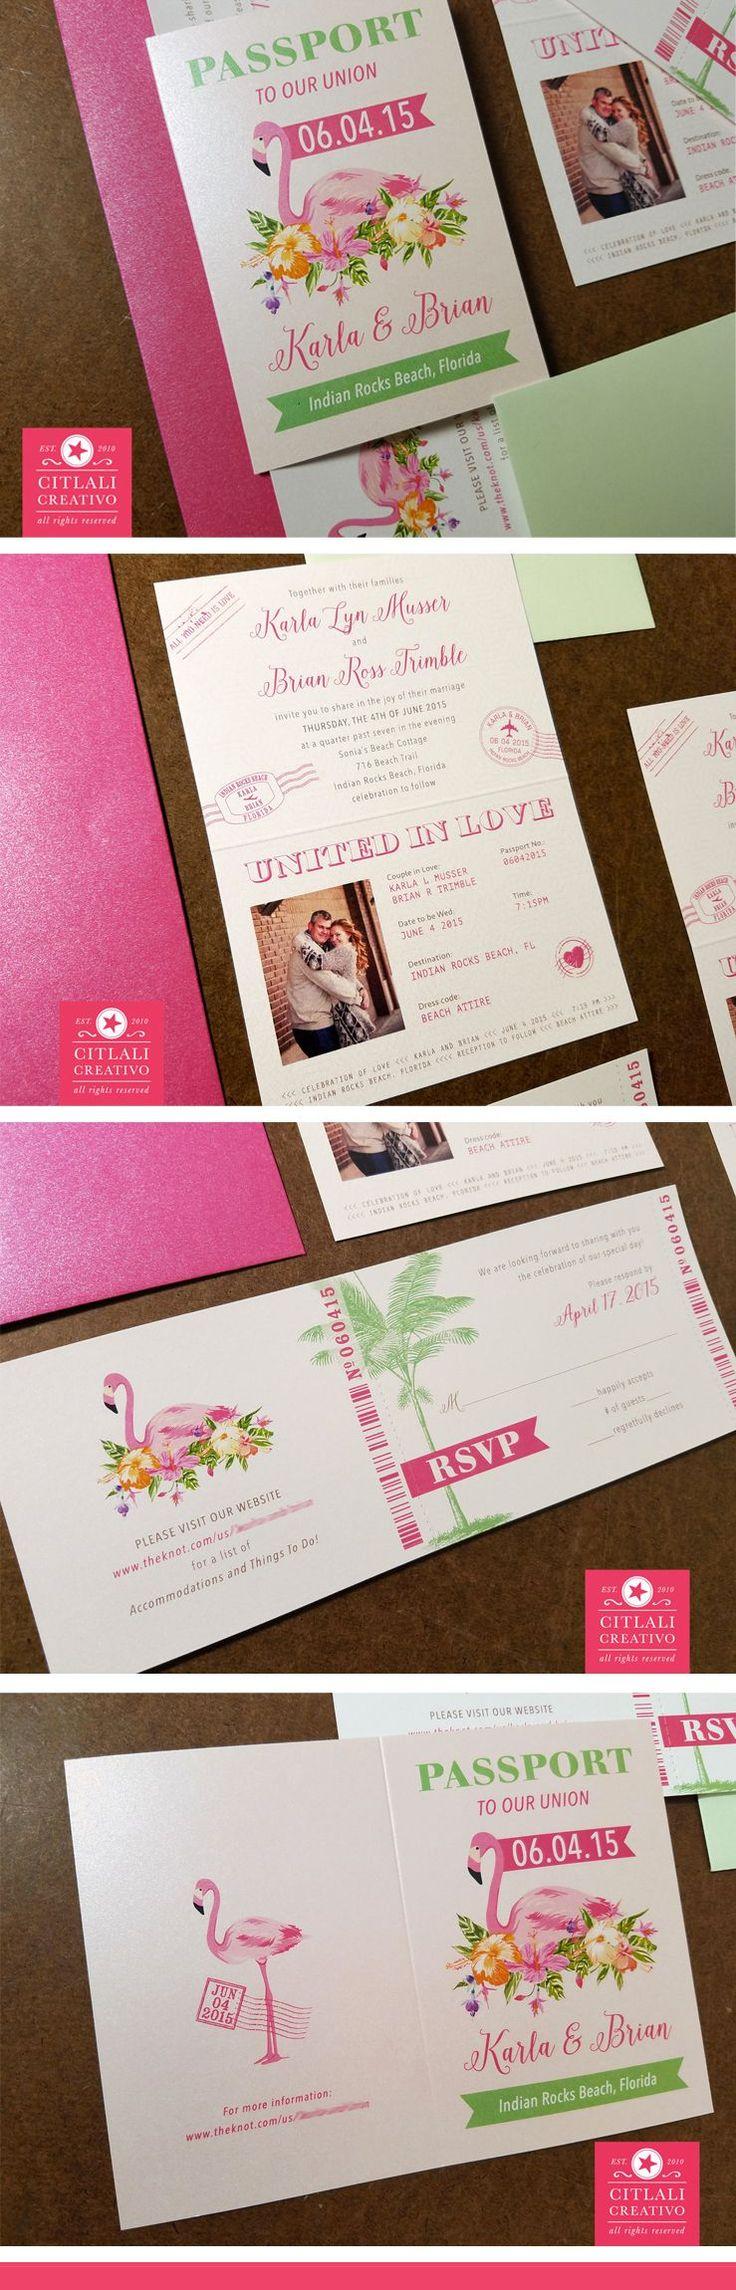 10 Best Passport Ticket Style Invitations Images On Pinterest